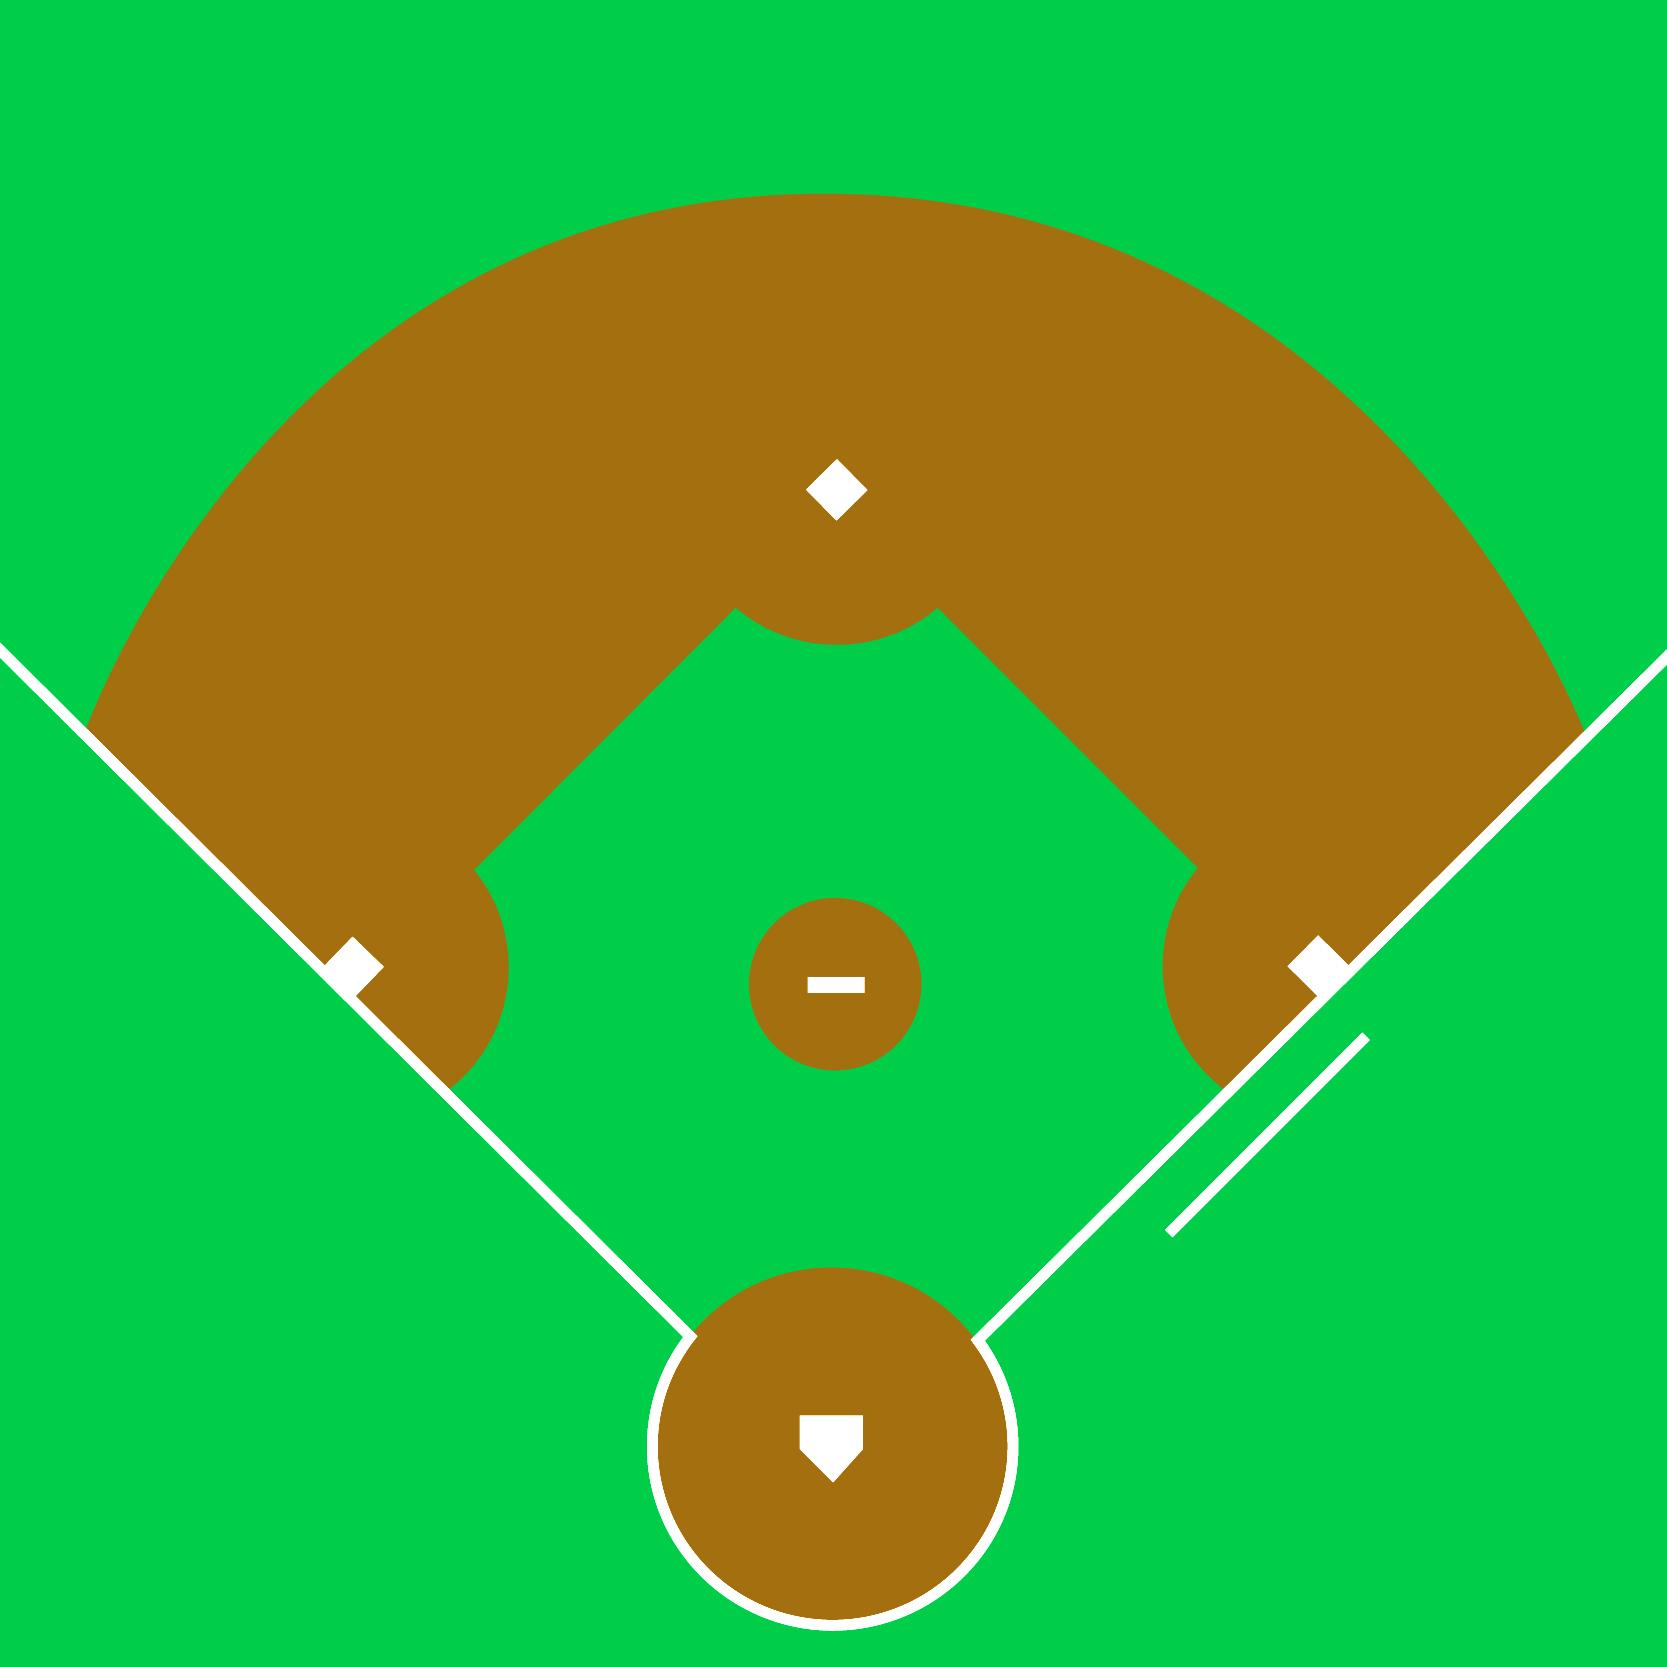 Baseball Diamond Images Baseball Diamond-Baseball Diamond Images Baseball Diamond And Bats On-7